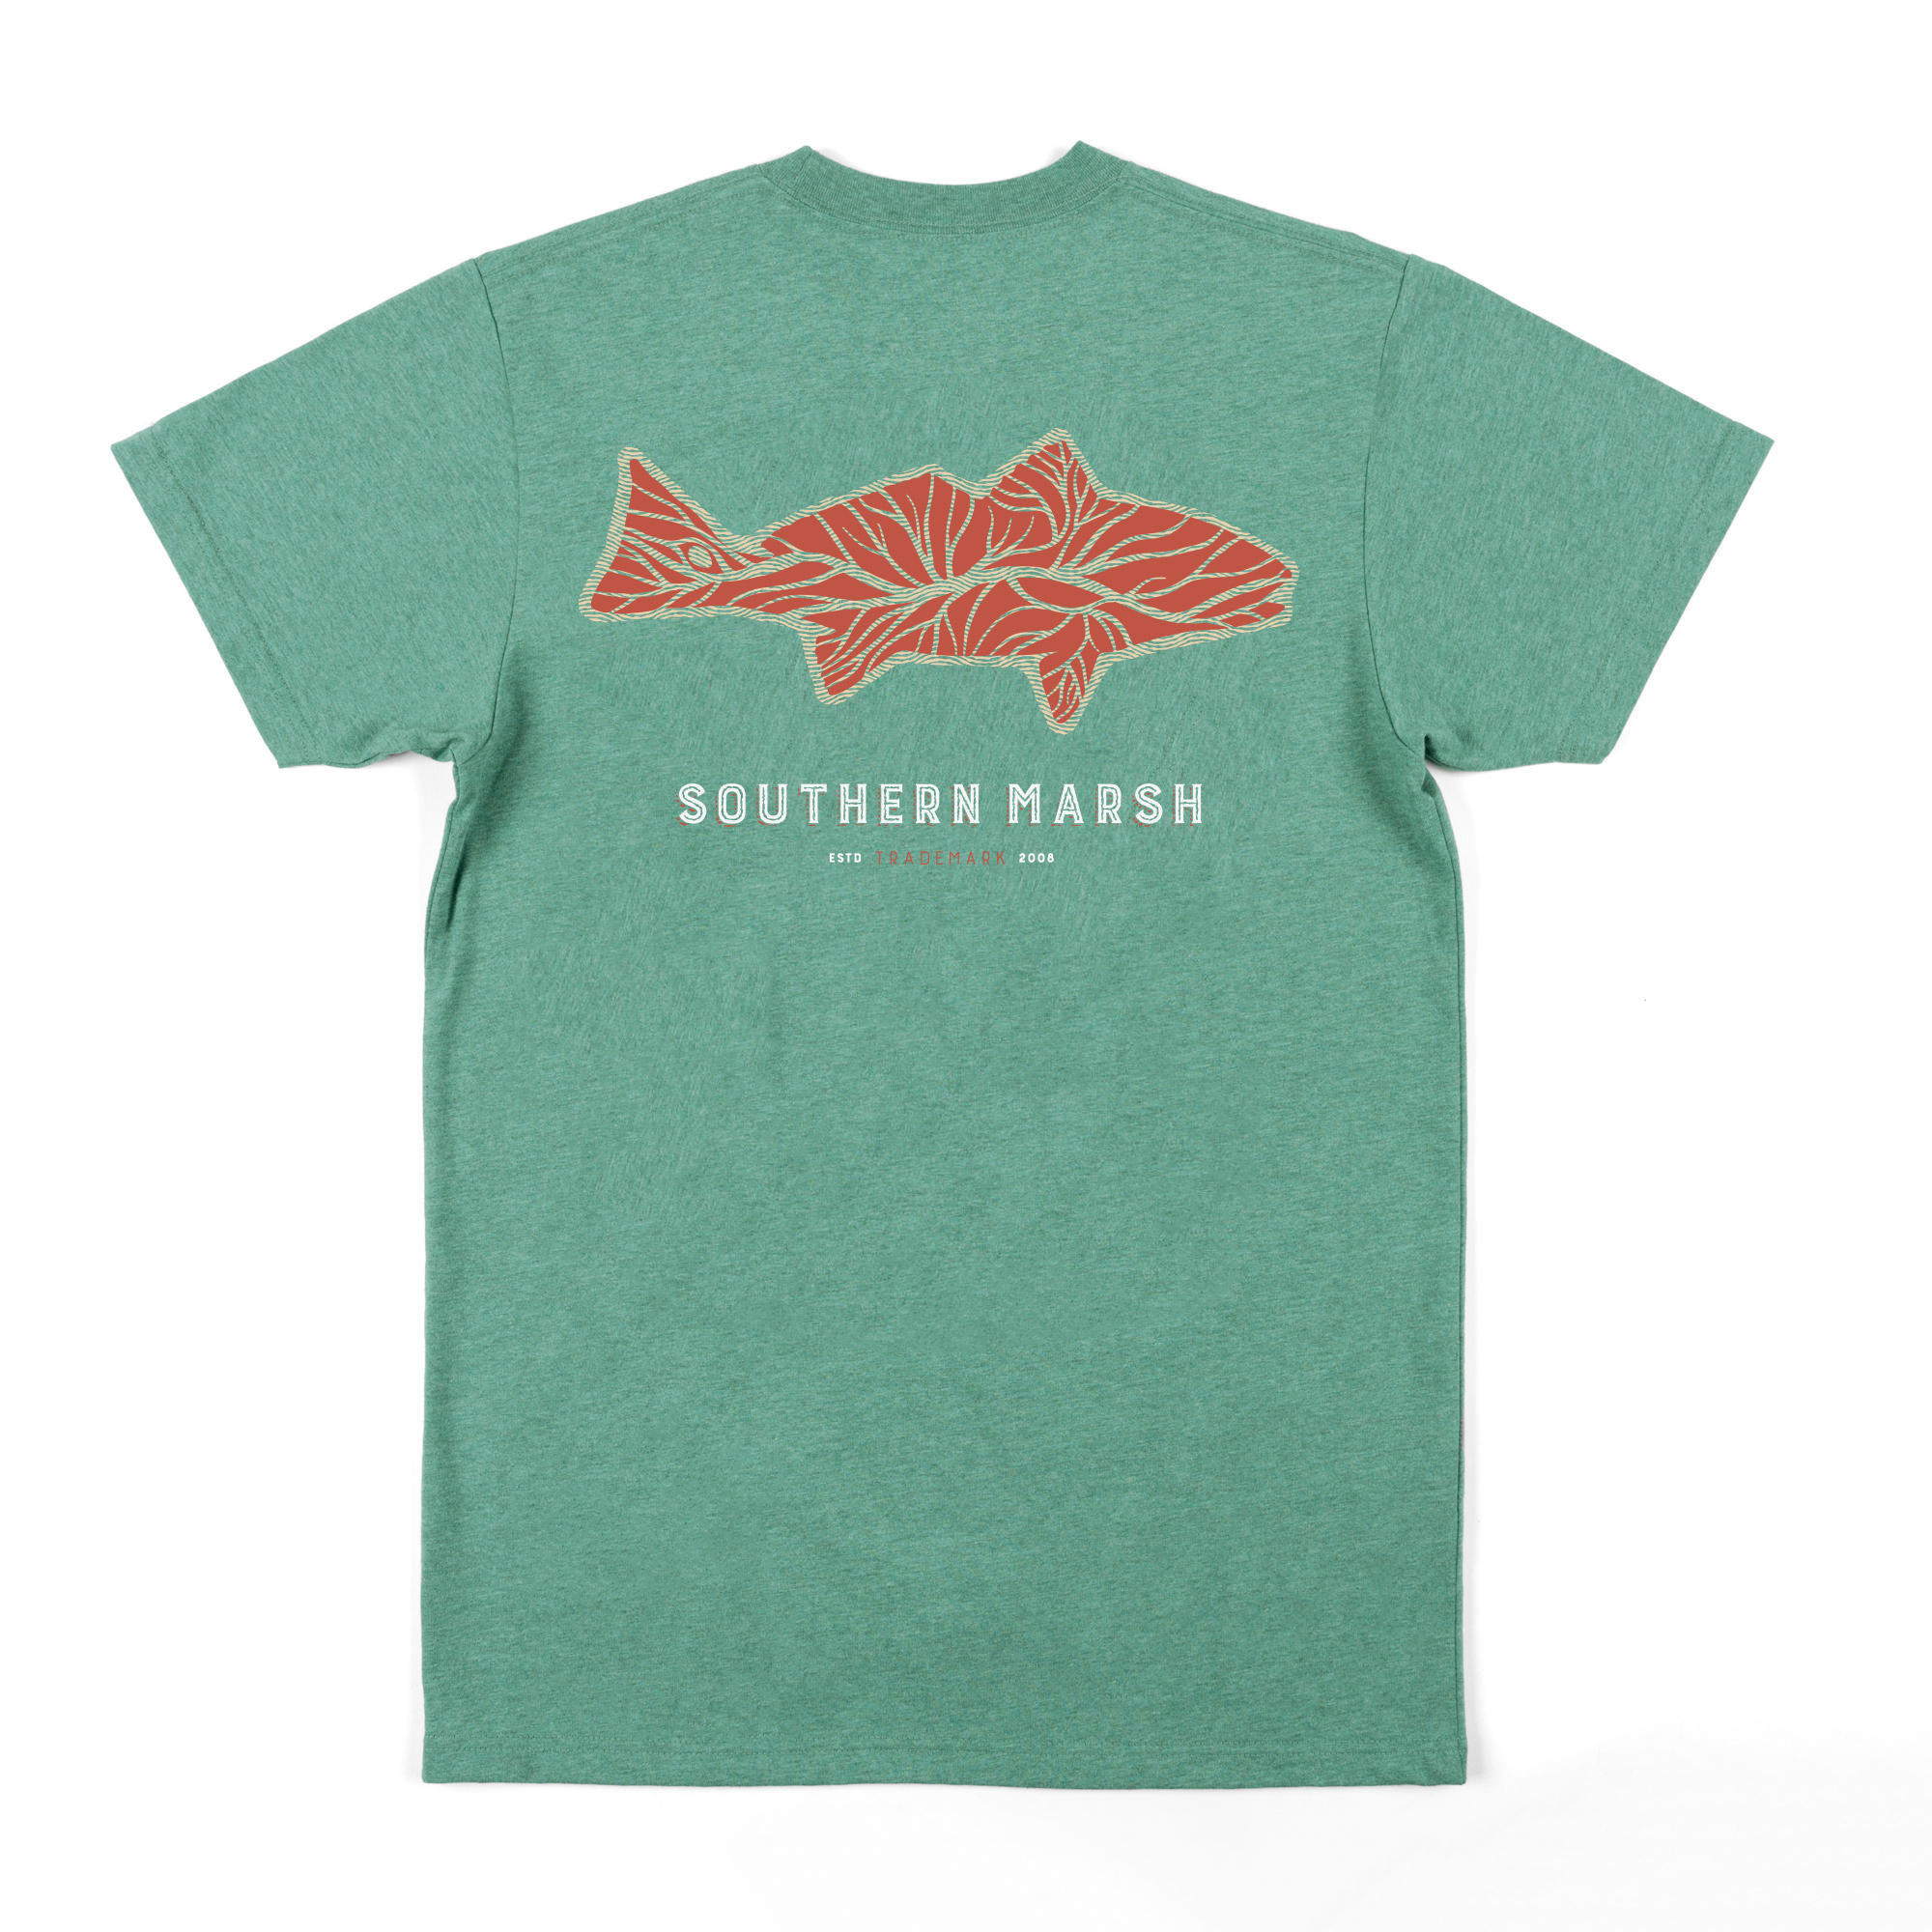 Southern Marsh Delta Fish Tee - Short Sleeve